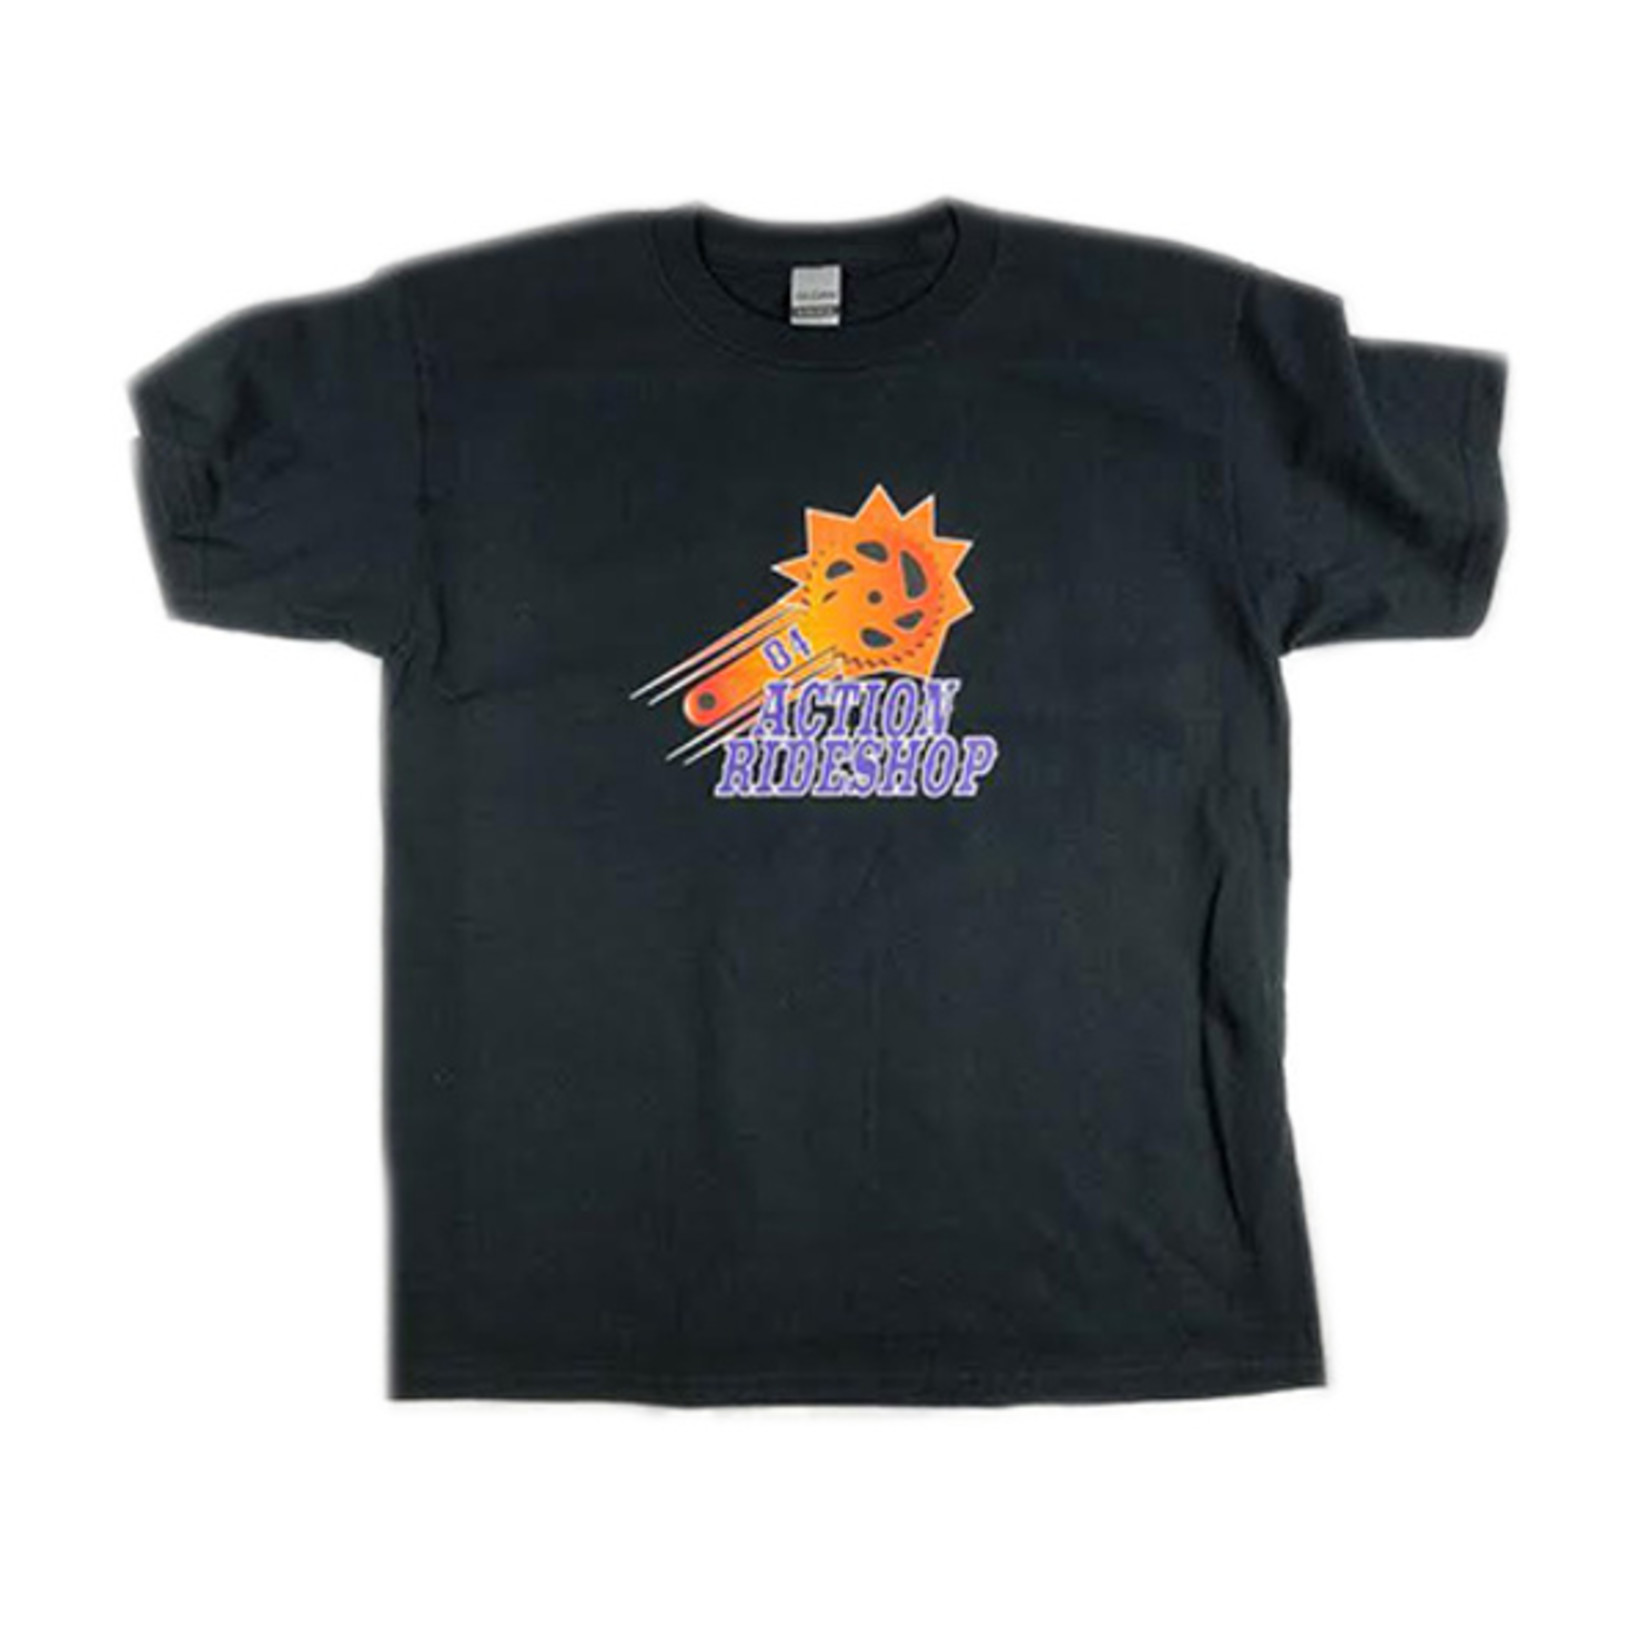 Action Rideshop Suns Youth